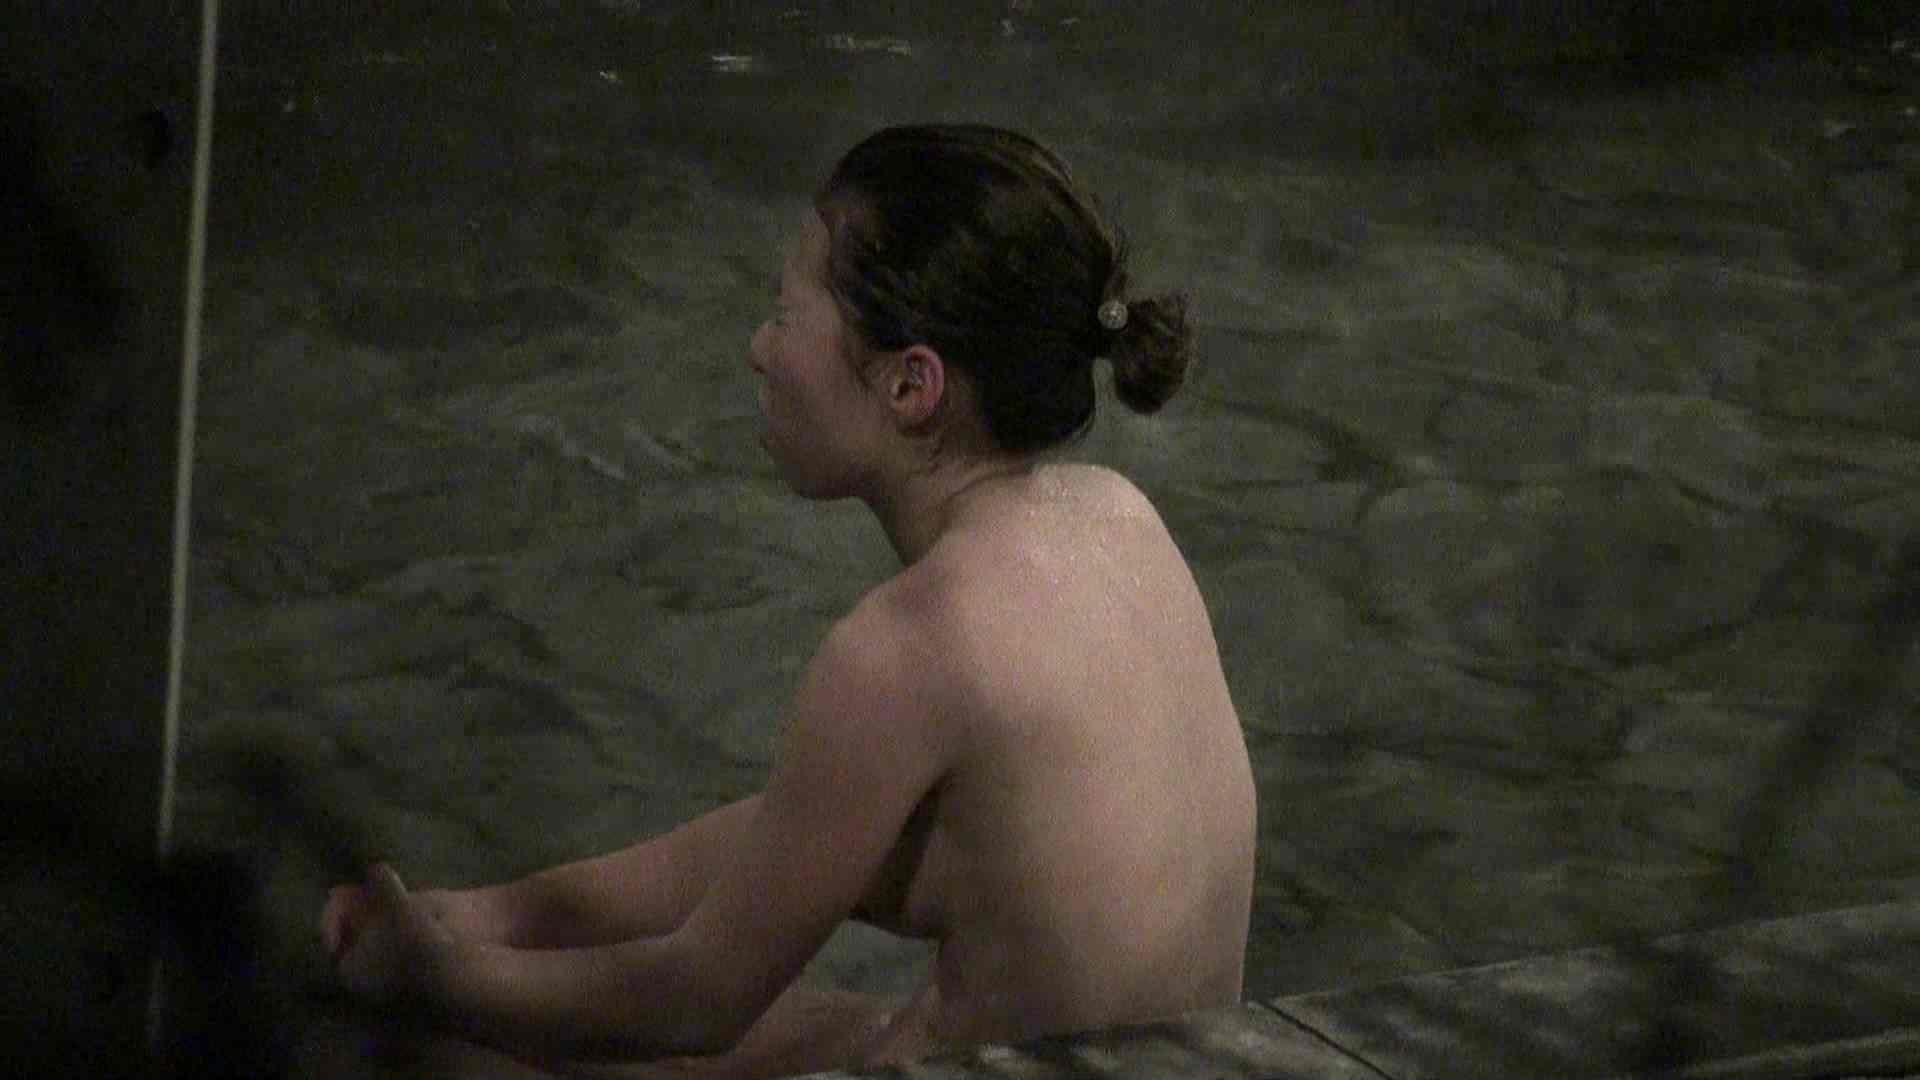 Aquaな露天風呂Vol.391 盗撮師作品 | 露天風呂突入  99pic 94